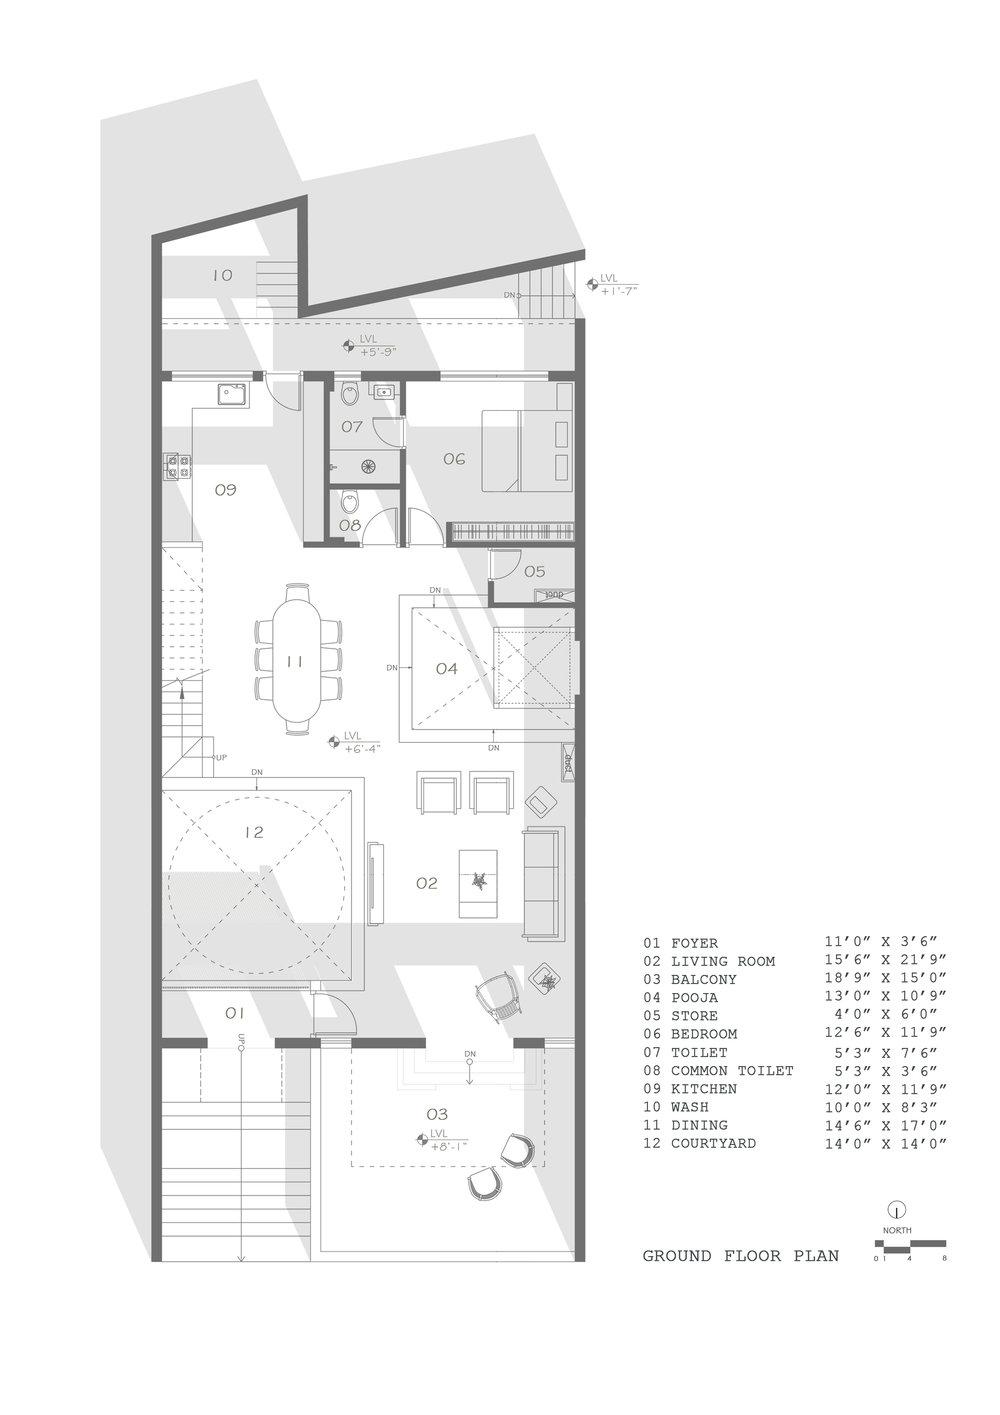 01 Ground floor plan.jpg